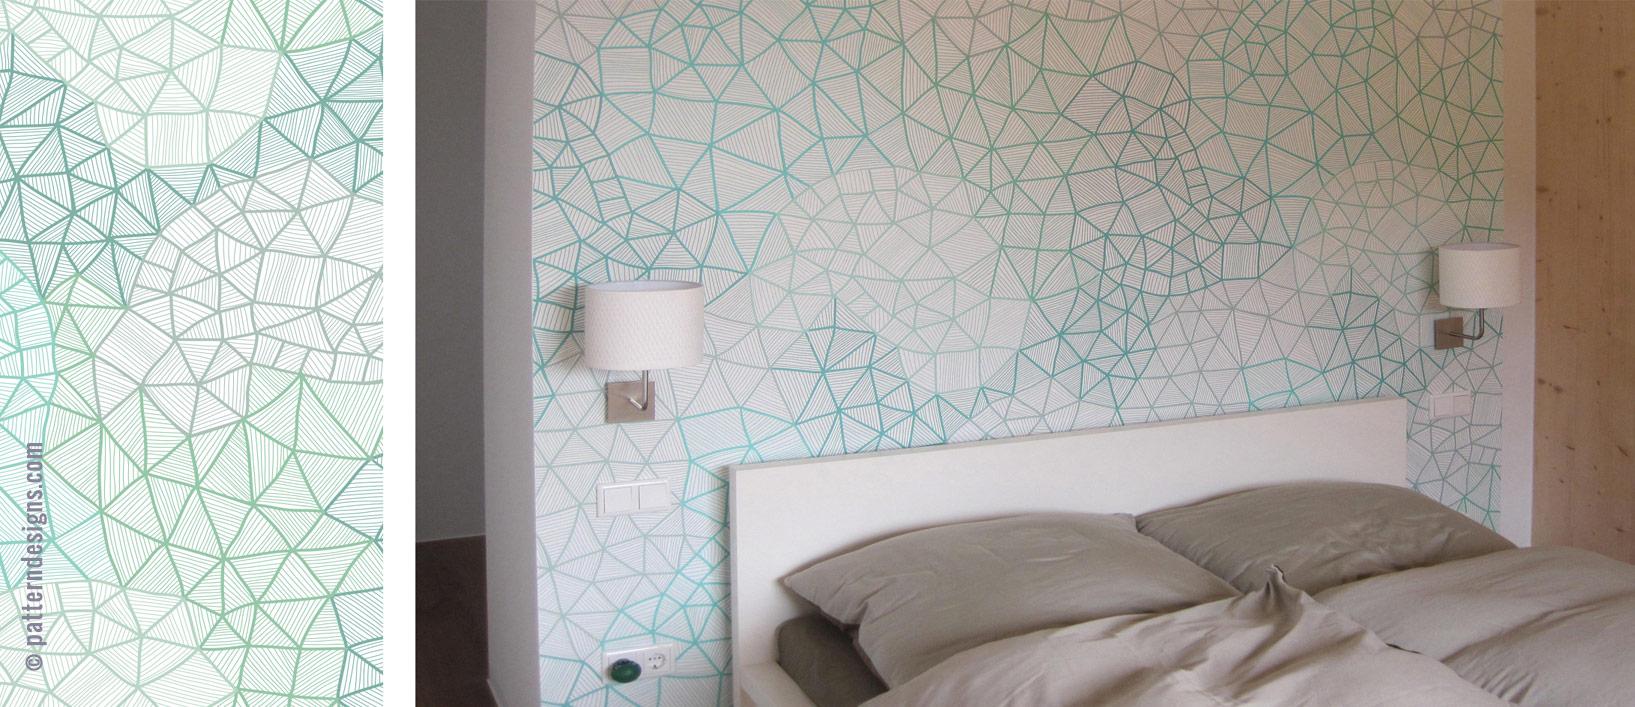 patterndesigns07